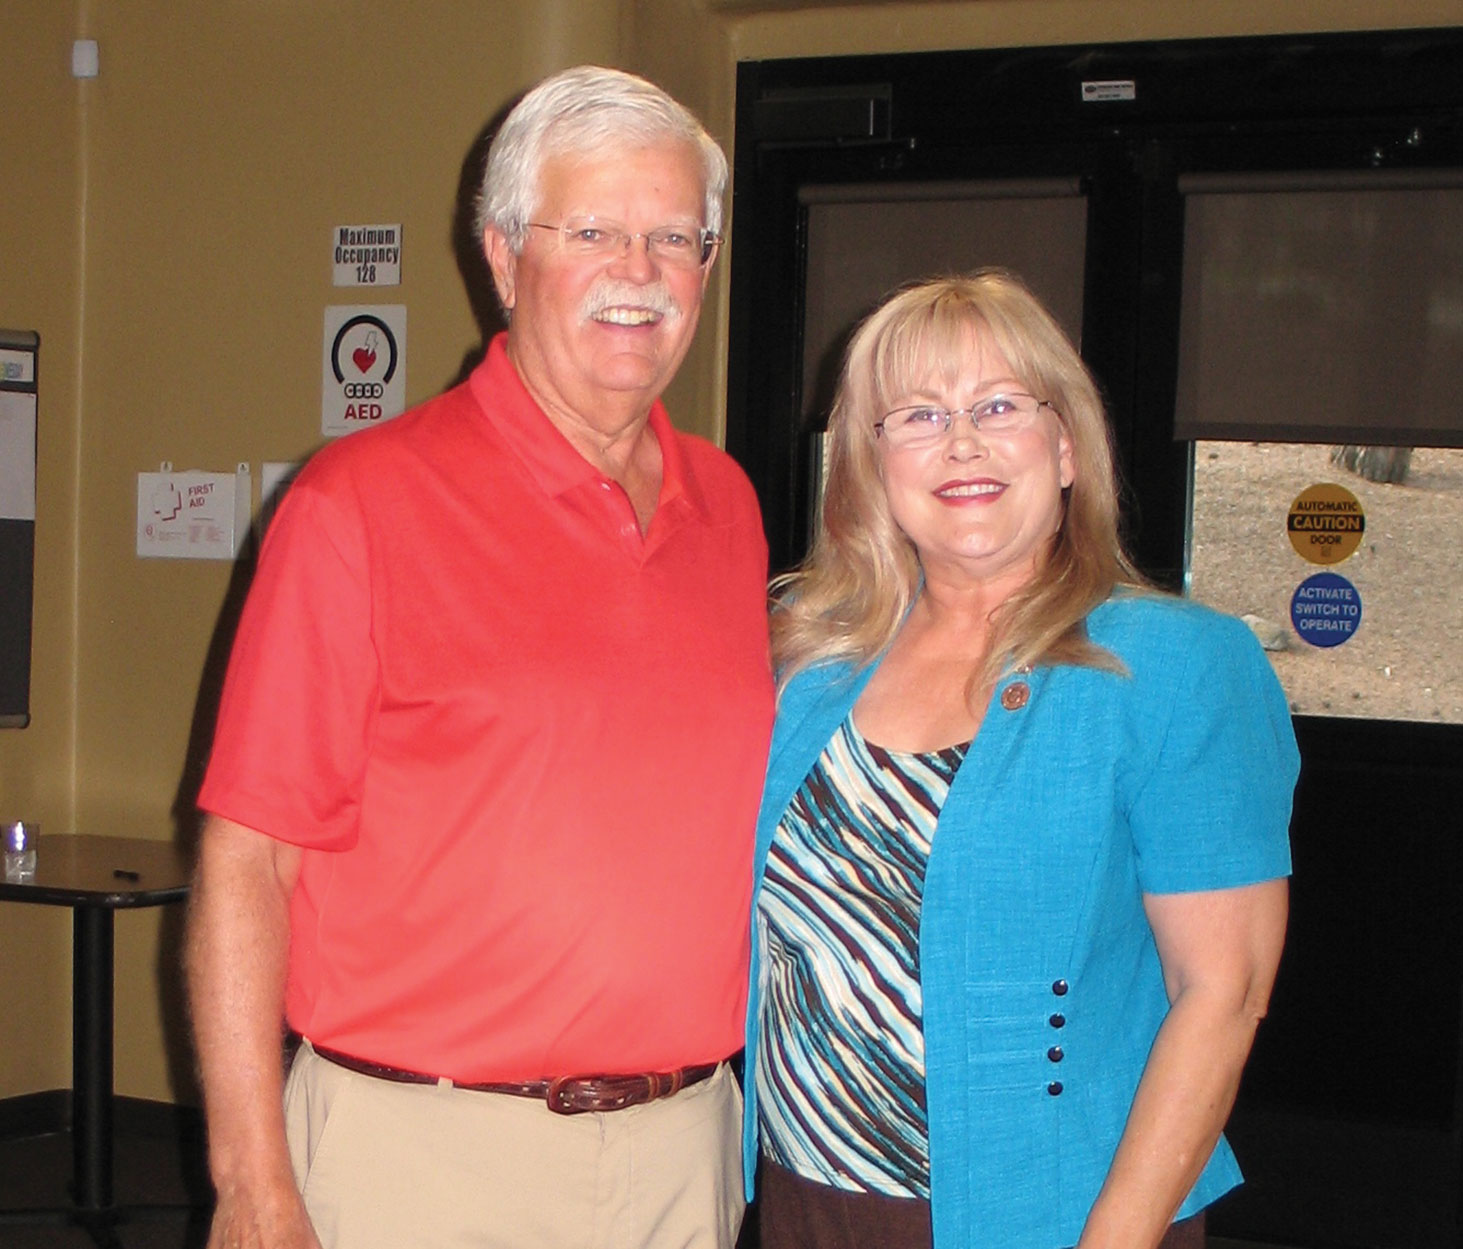 SaddleBrooke Democrats Chairman Stephen Groth and Arizona State Senator Barbara McGuire